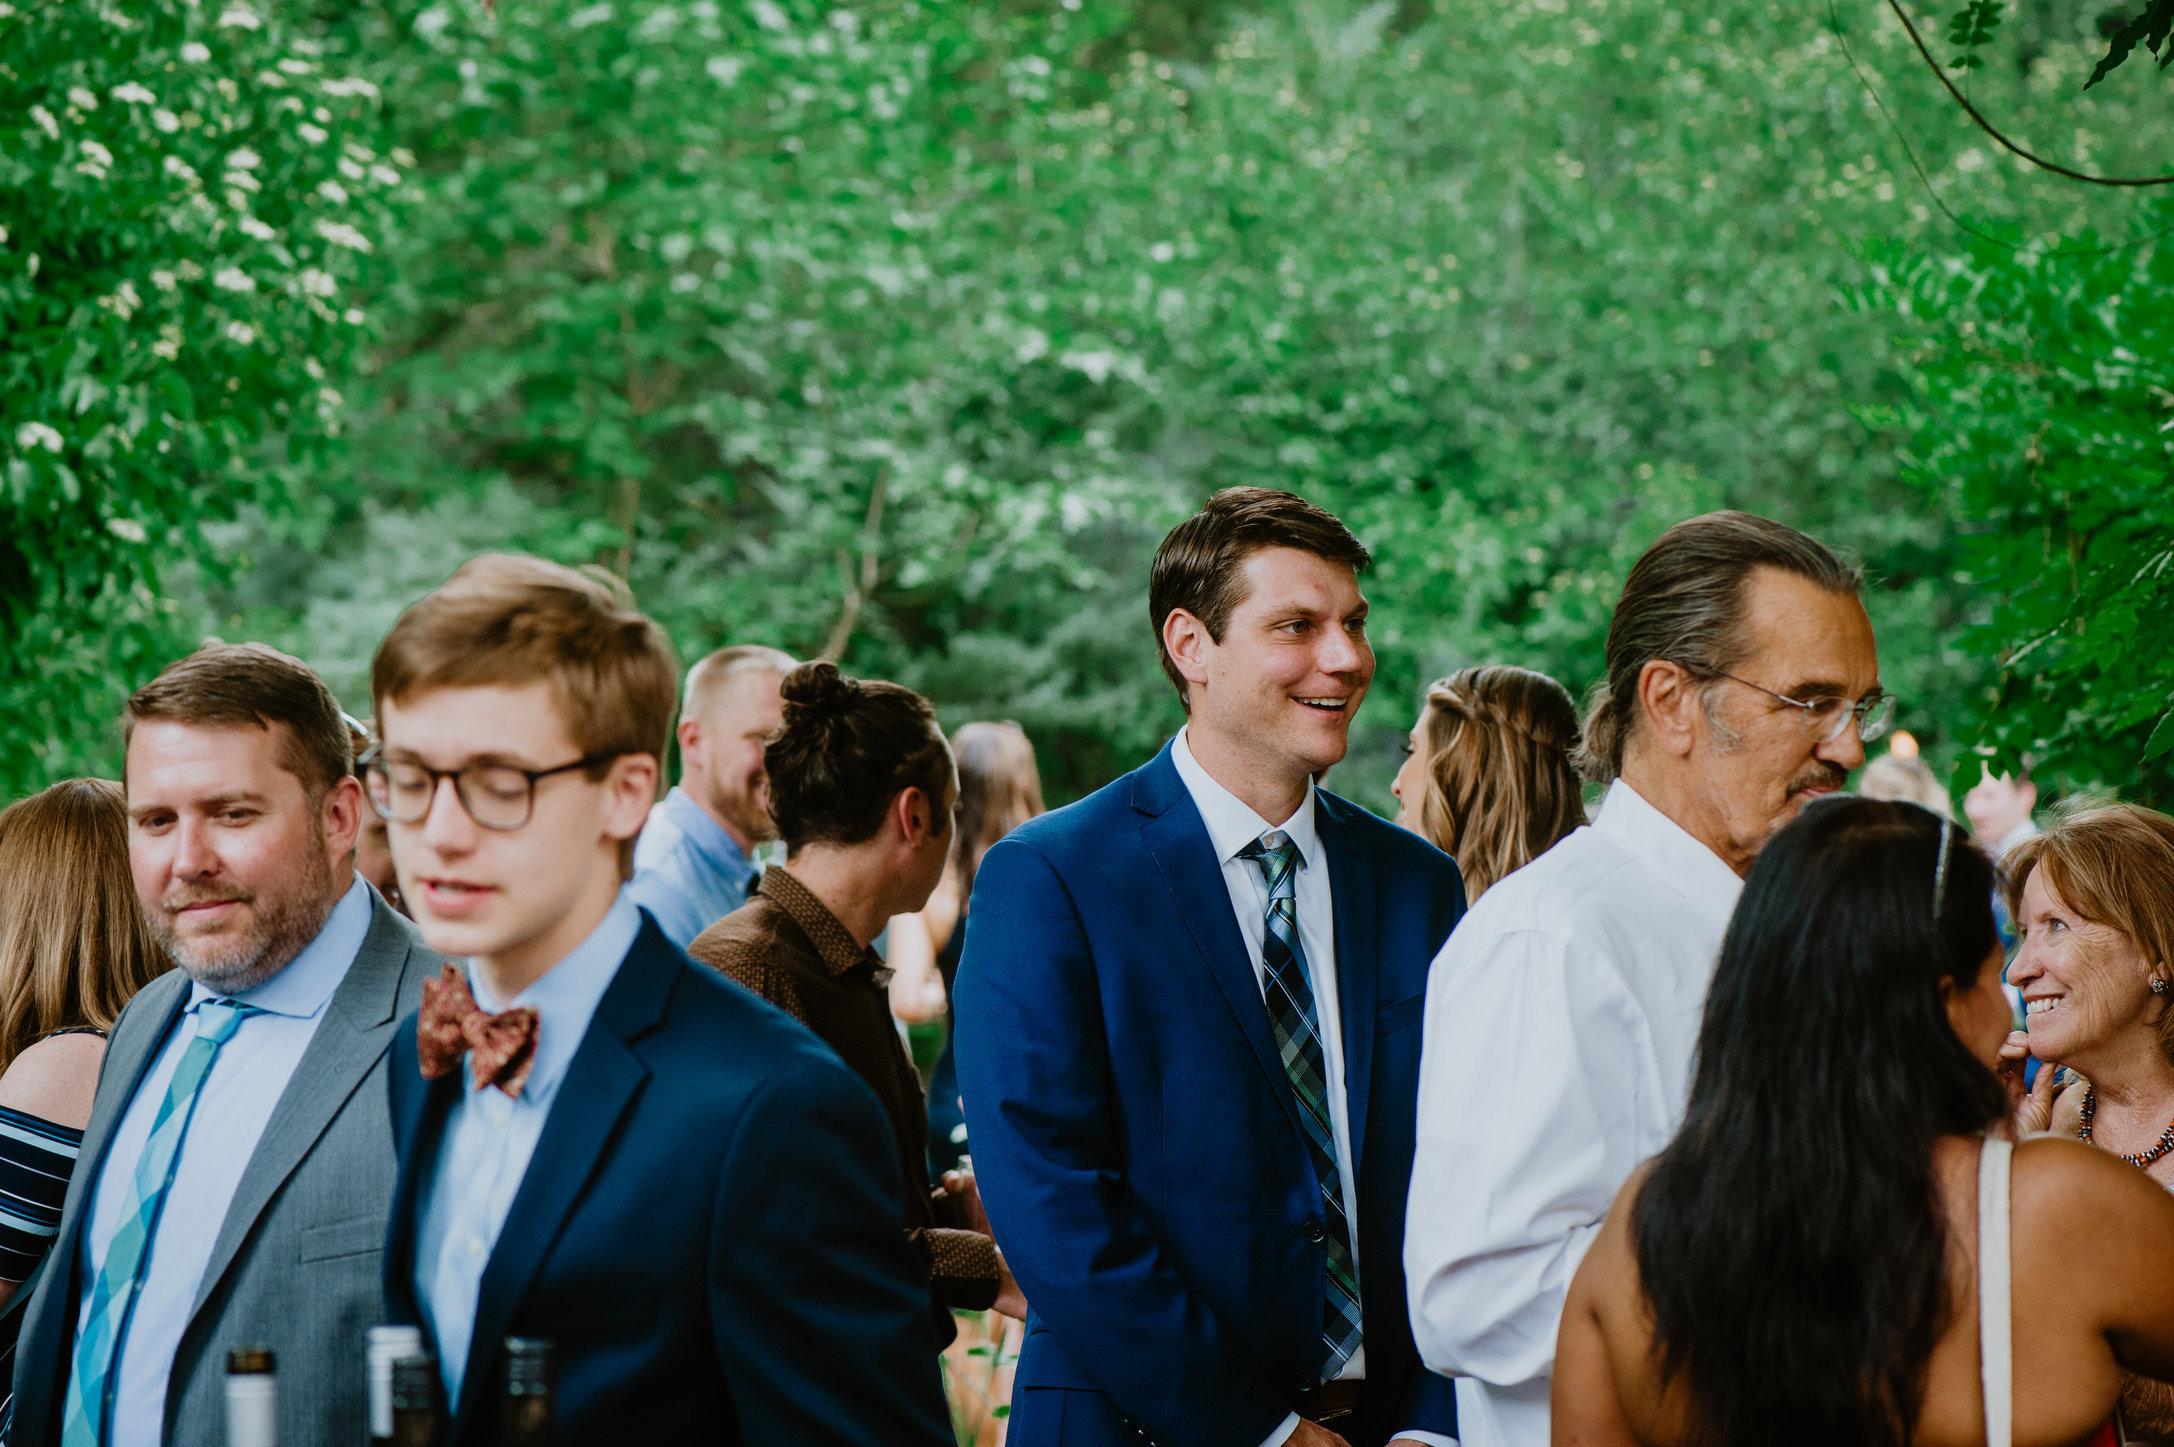 DandA-wedding-356.jpg